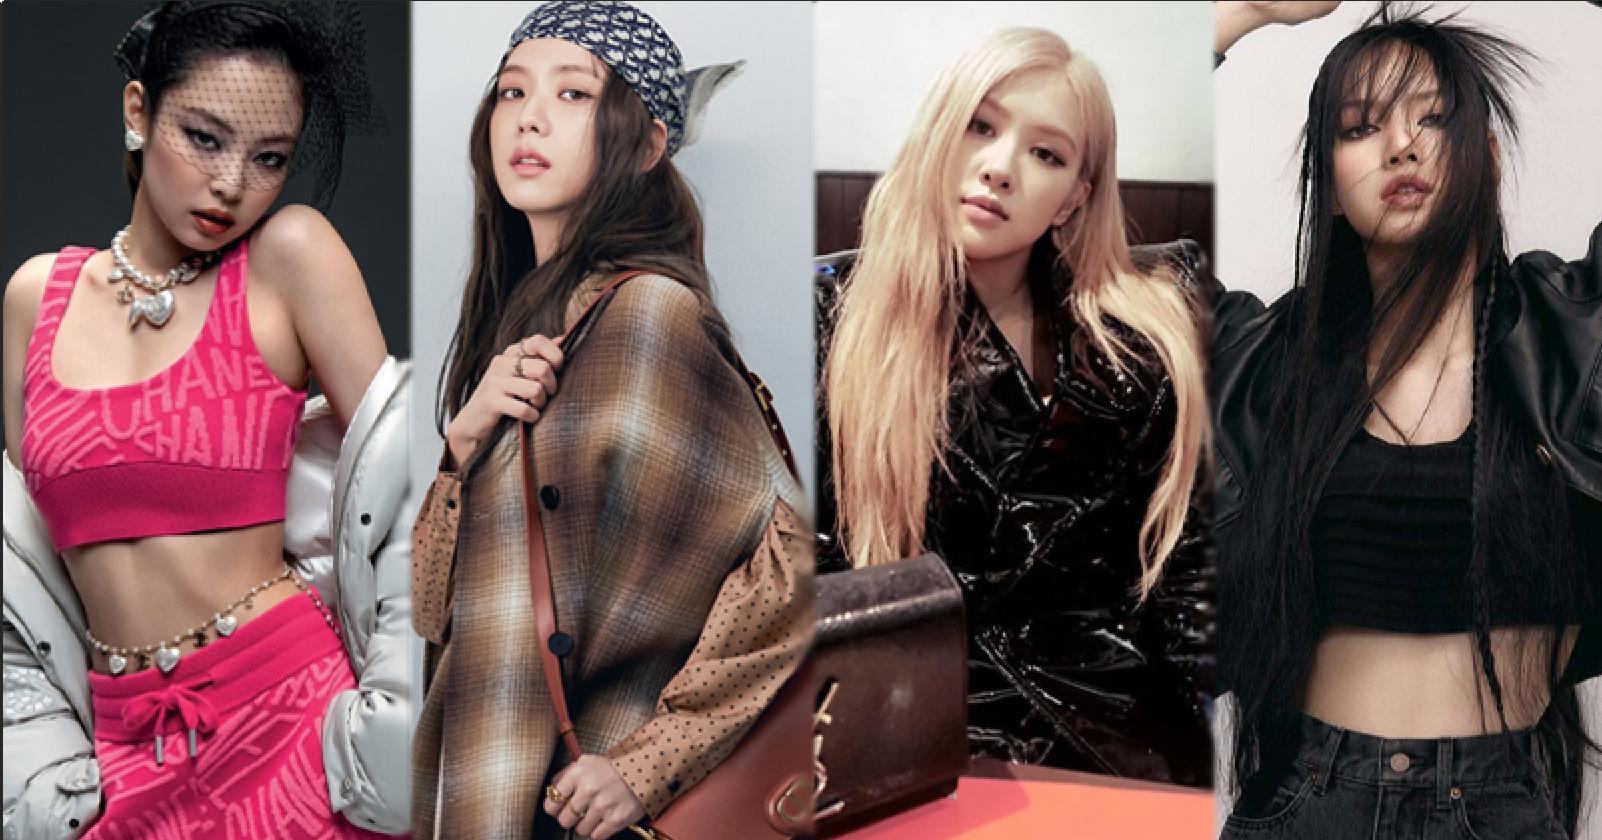 BLACKPINK Members to Attend Paris Fashion Week as Luxury Brands' Global Ambassadors